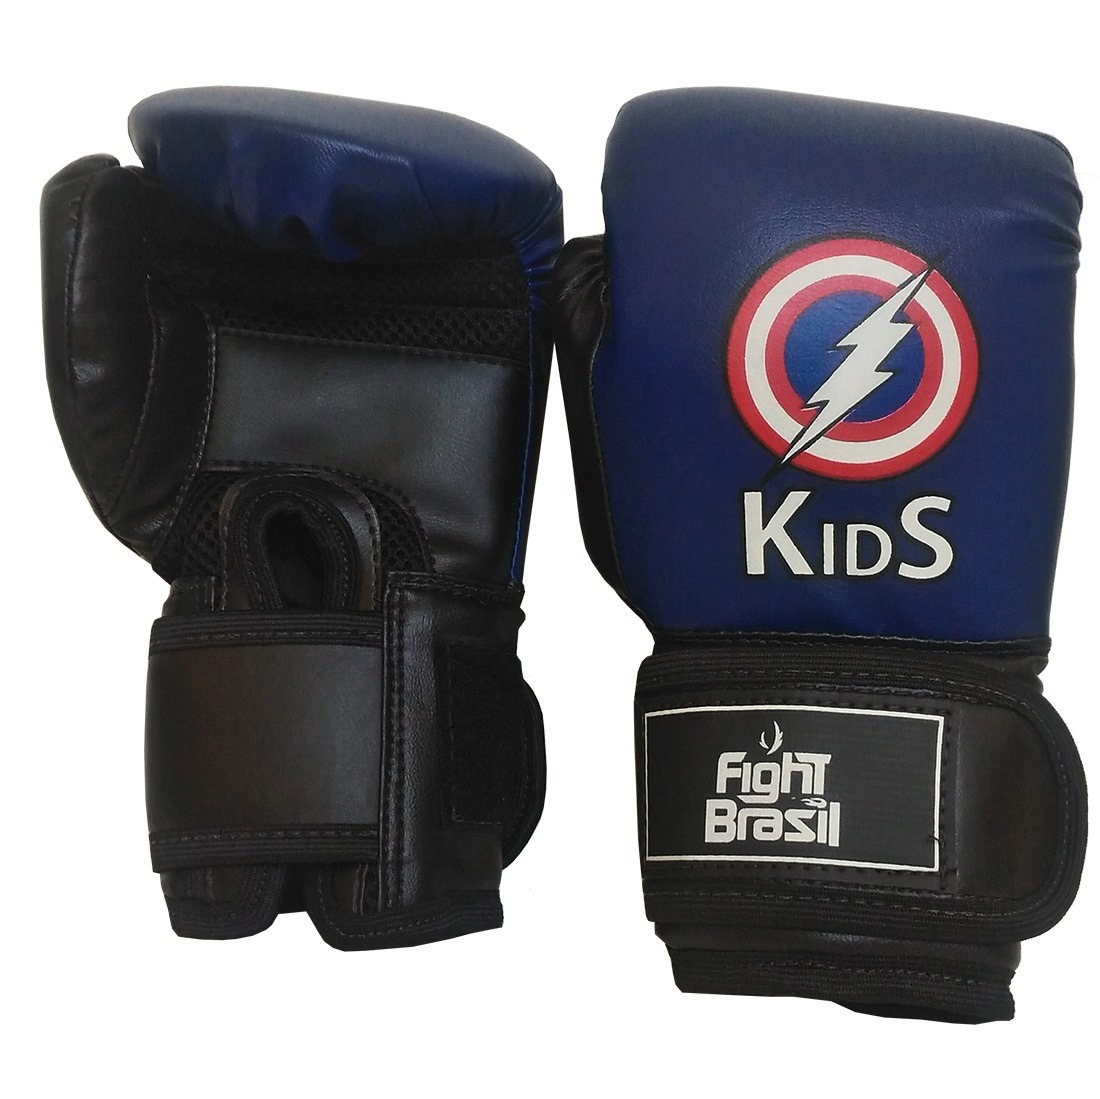 a67fdac68 luva muay thai boxe infantil fight brasil 4 oz azul top. Carregando zoom.